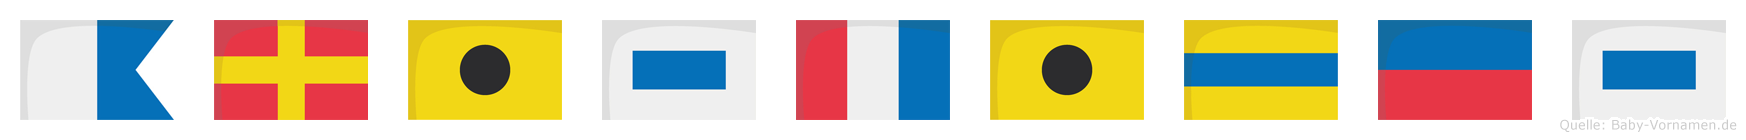 Aristides im Flaggenalphabet